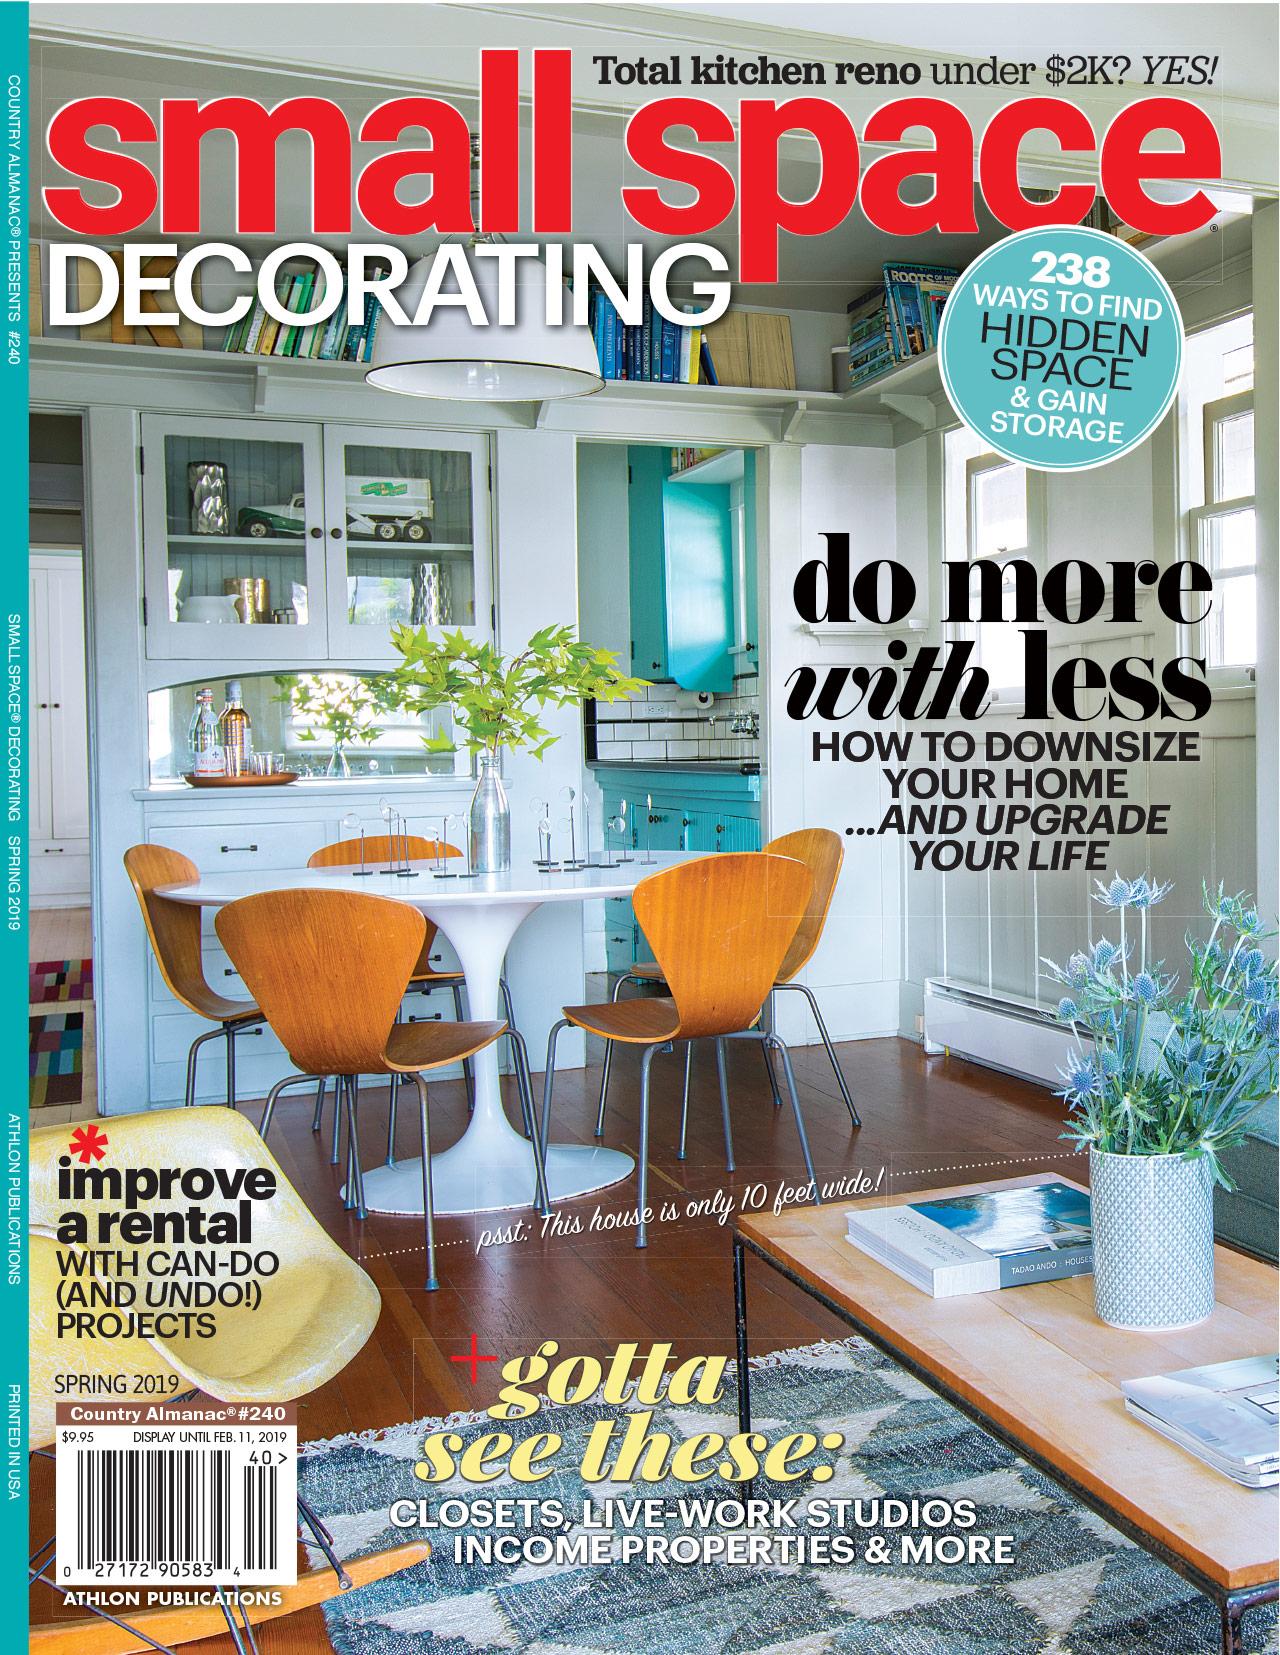 studio-m-interior-design-featured-in-small-space-magazine